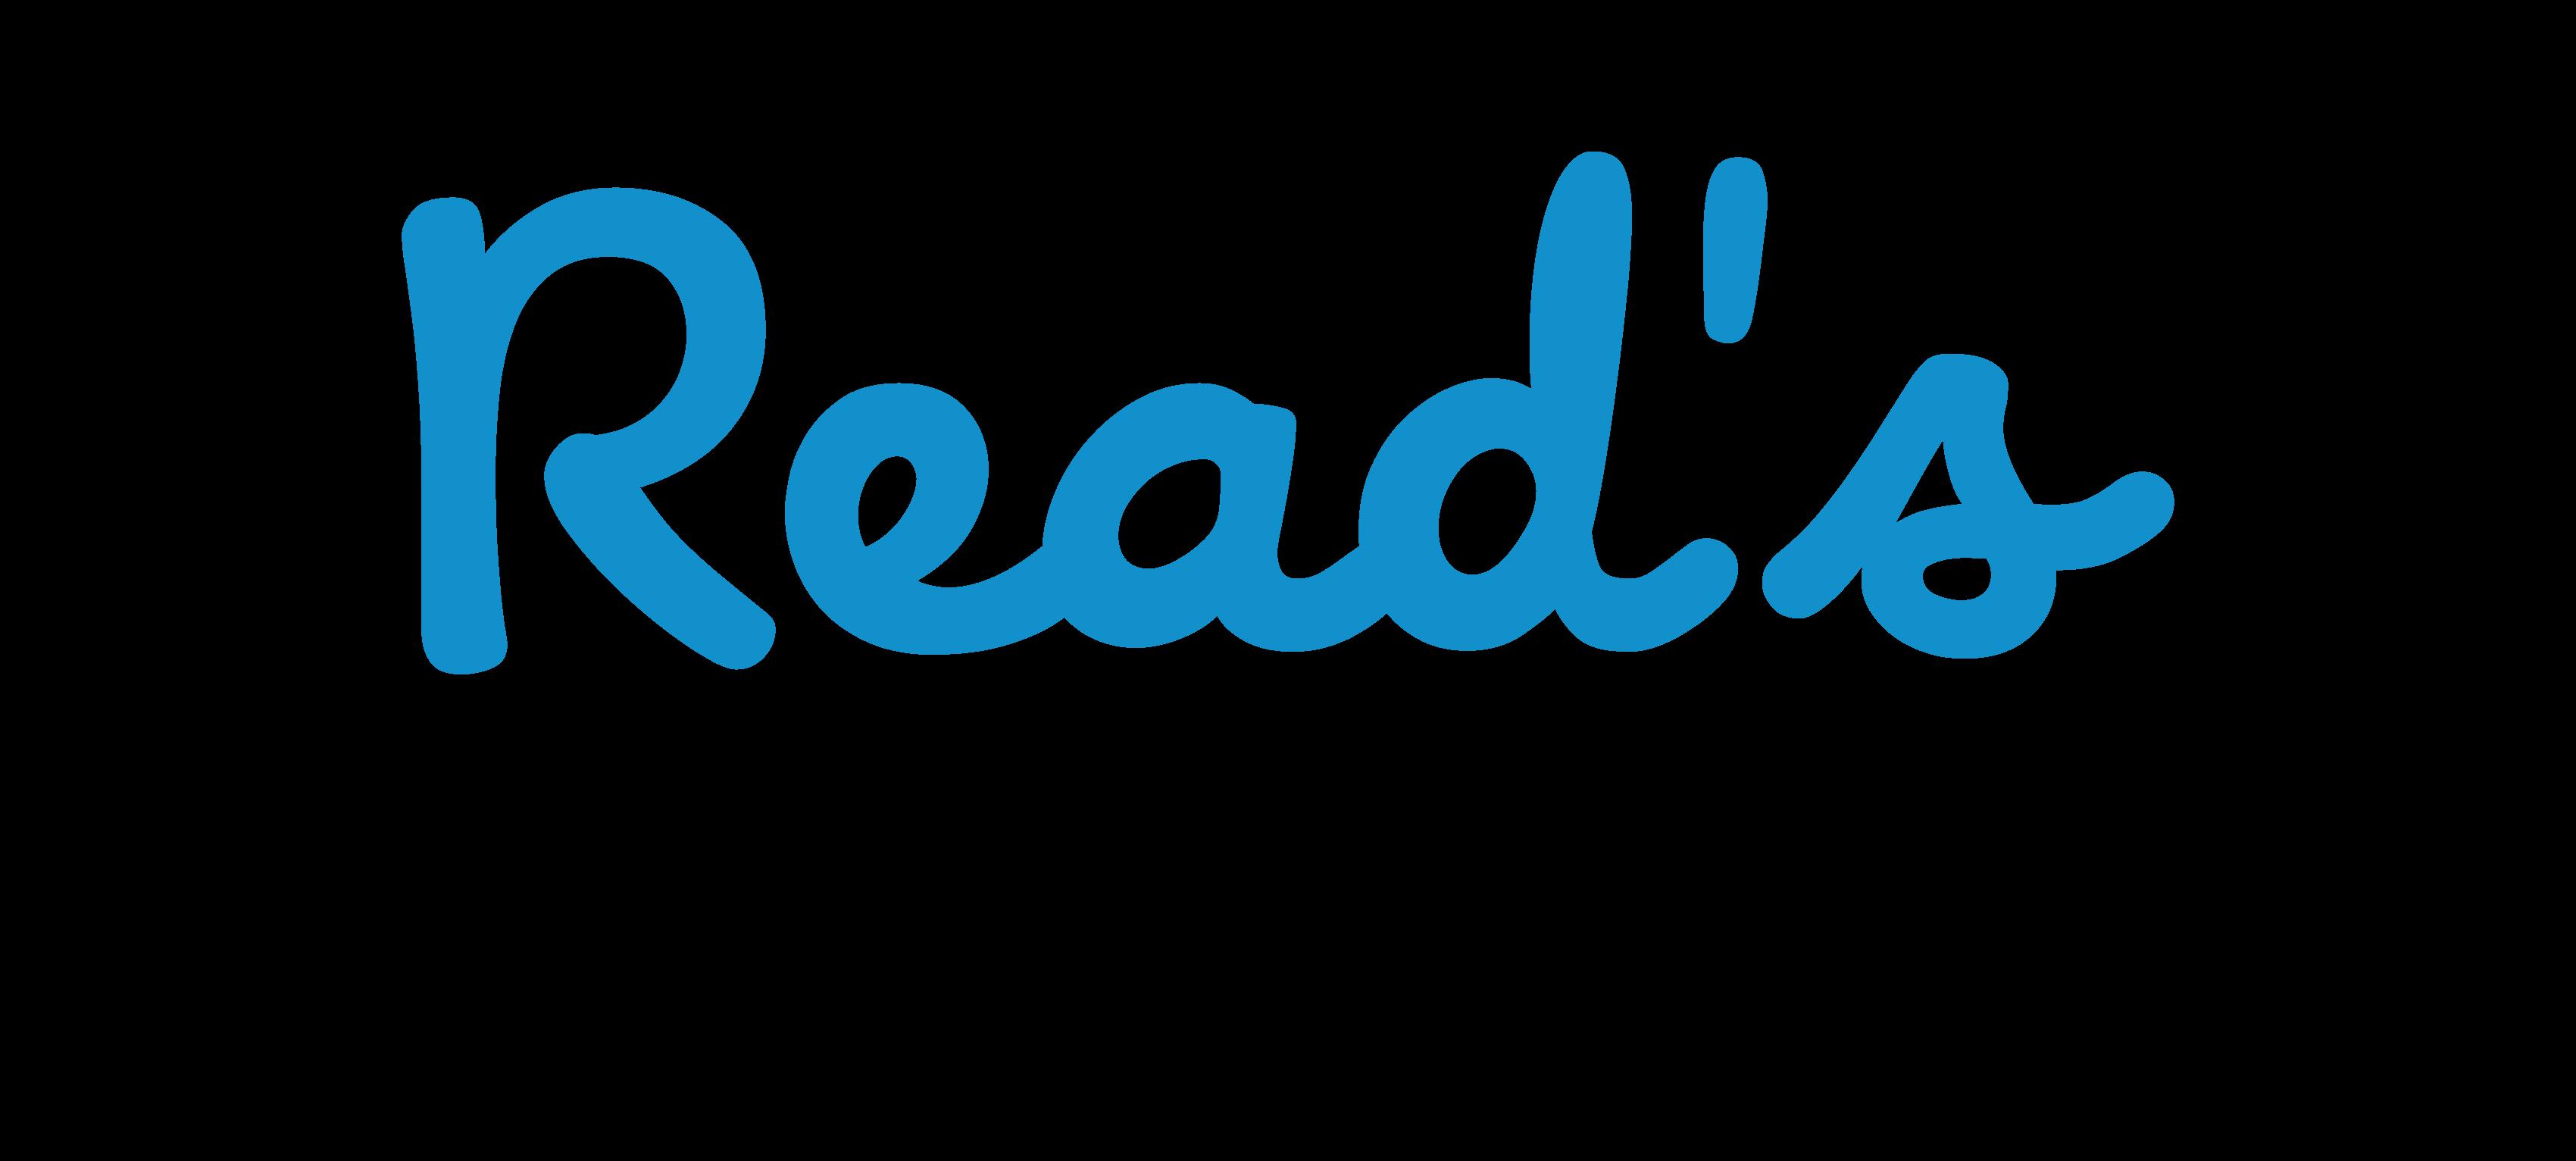 Read's Australian Labradoodles